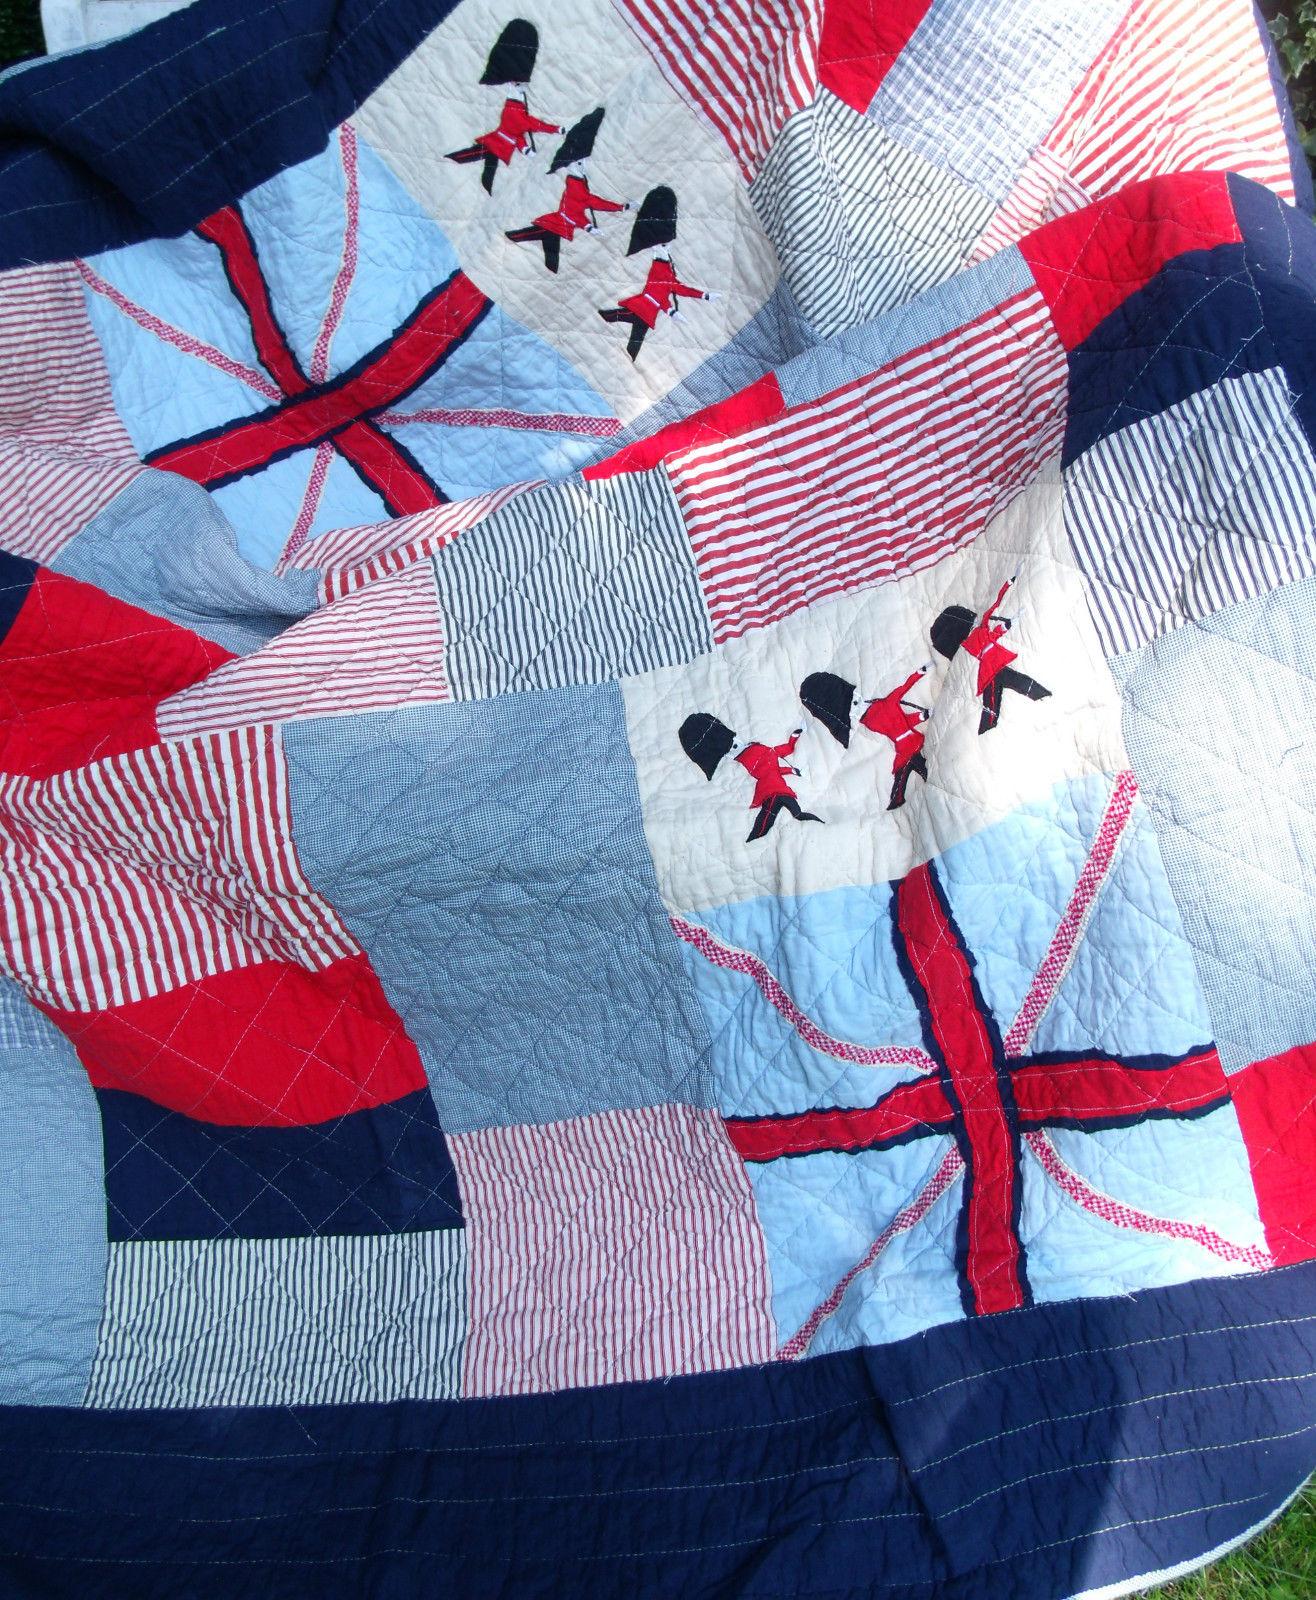 decke england 150x150 tagesdecke krabbeldecke blau wei rot berwurf tagesdecken. Black Bedroom Furniture Sets. Home Design Ideas